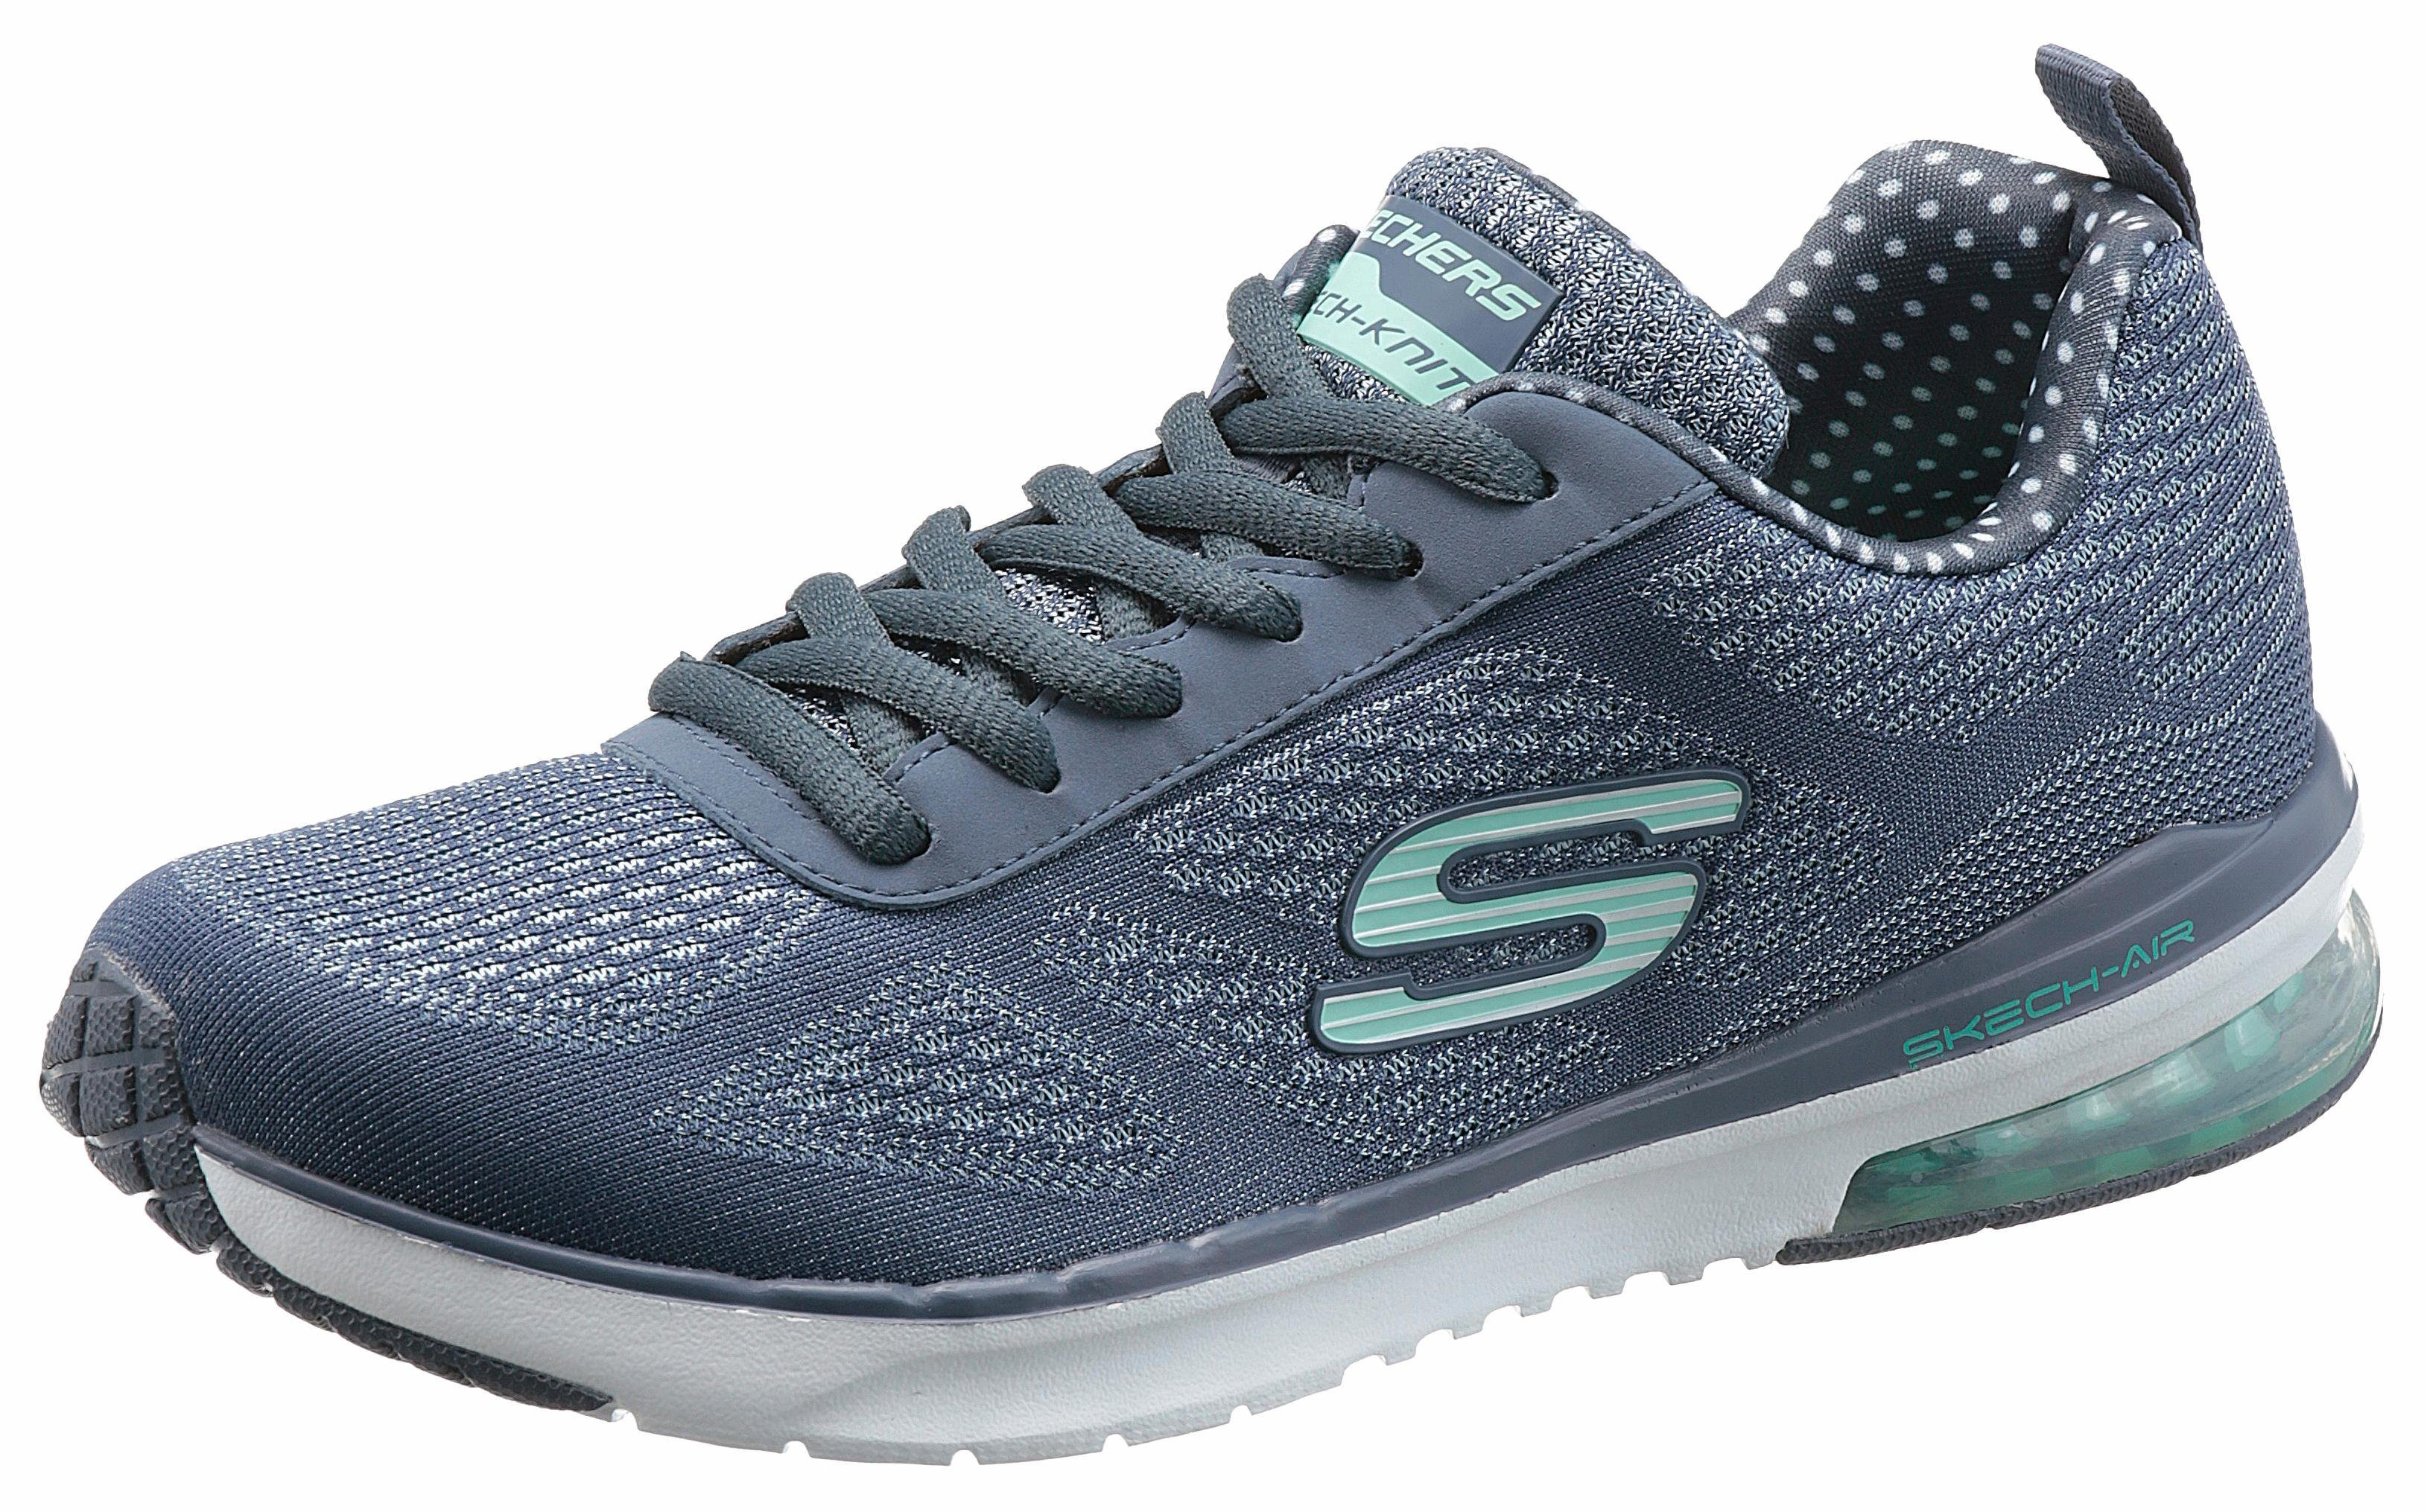 Skechers »Skech-Air Infinity« Sneaker, mit weich gepolsterter Memory Foam Ausstattung, blau, 36 36